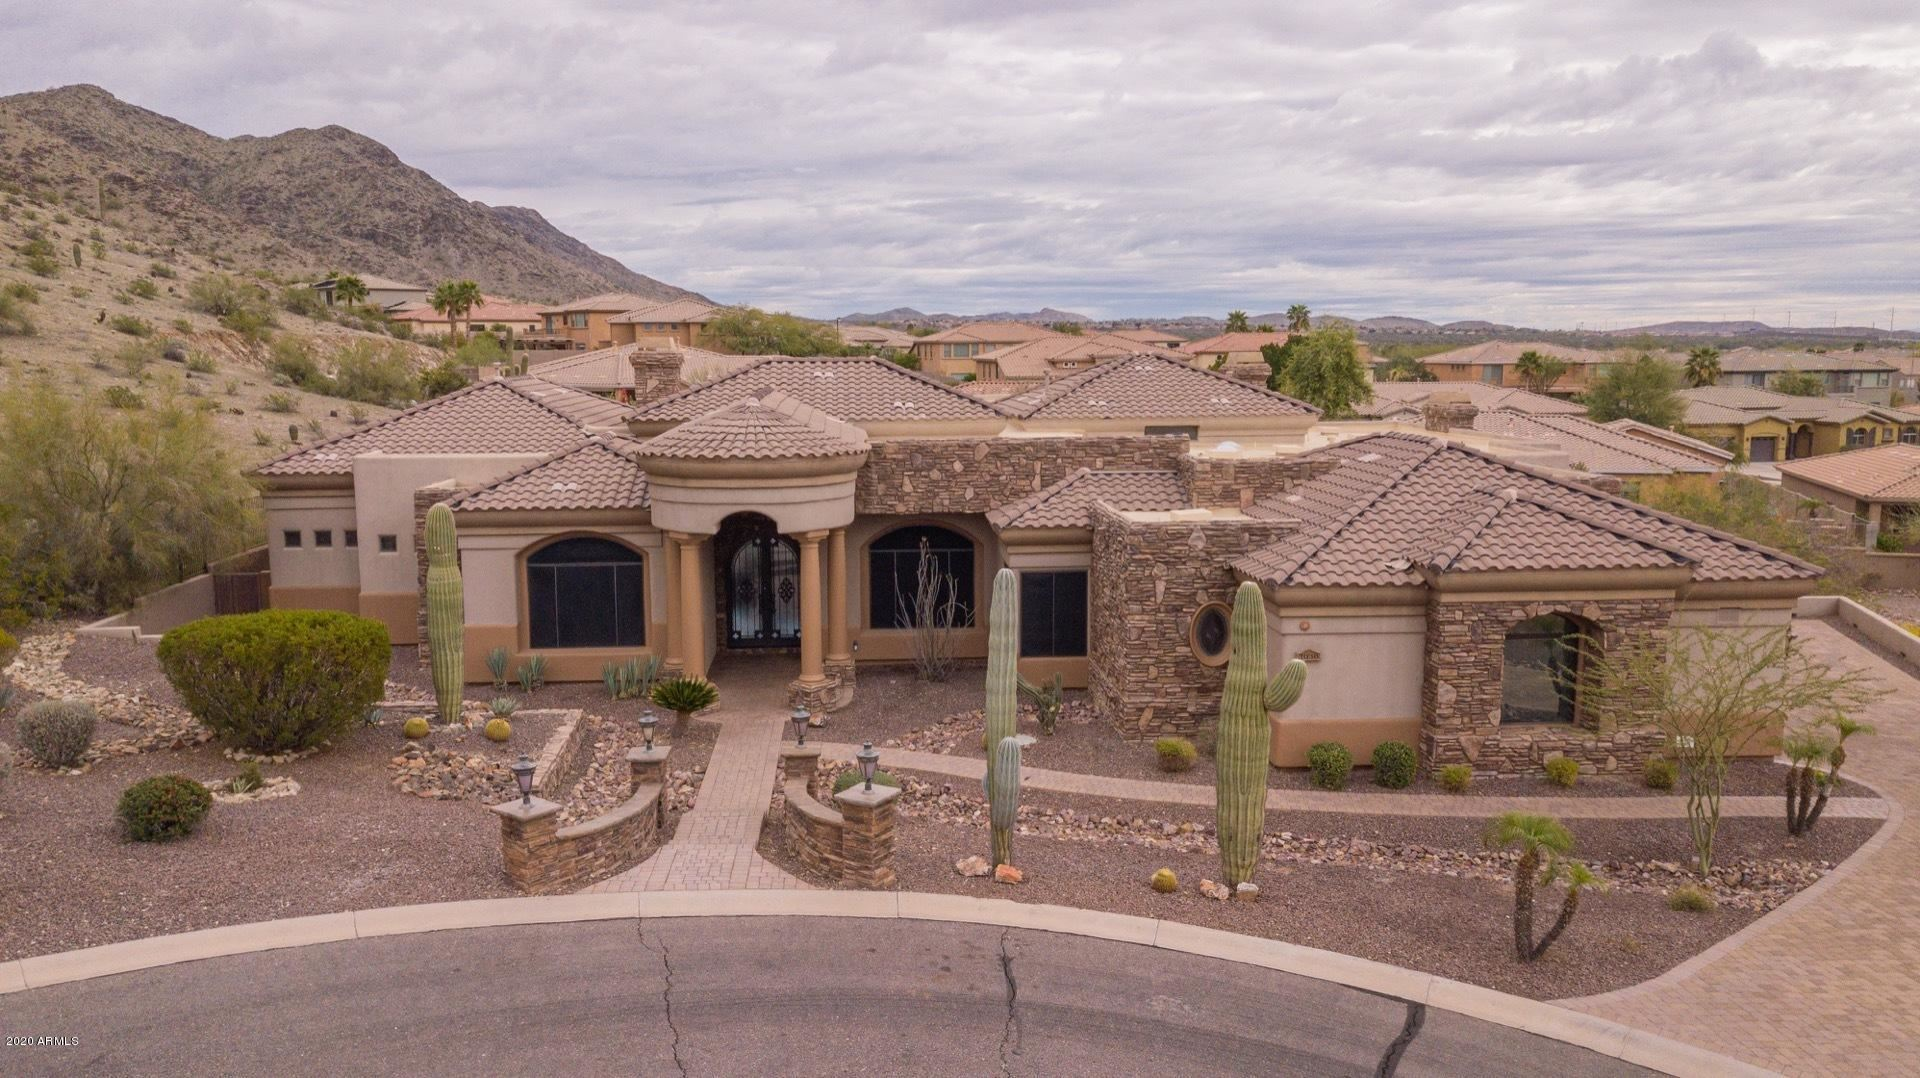 3038 W BRIARWOOD Terrace, Phoenix, AZ 85045 - MLS#: 6049205